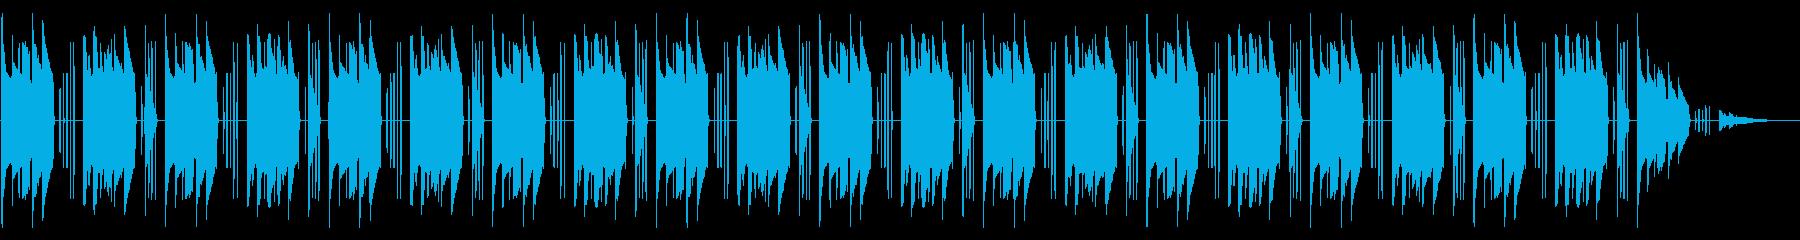 NES アクションB02-1(ステージ2の再生済みの波形